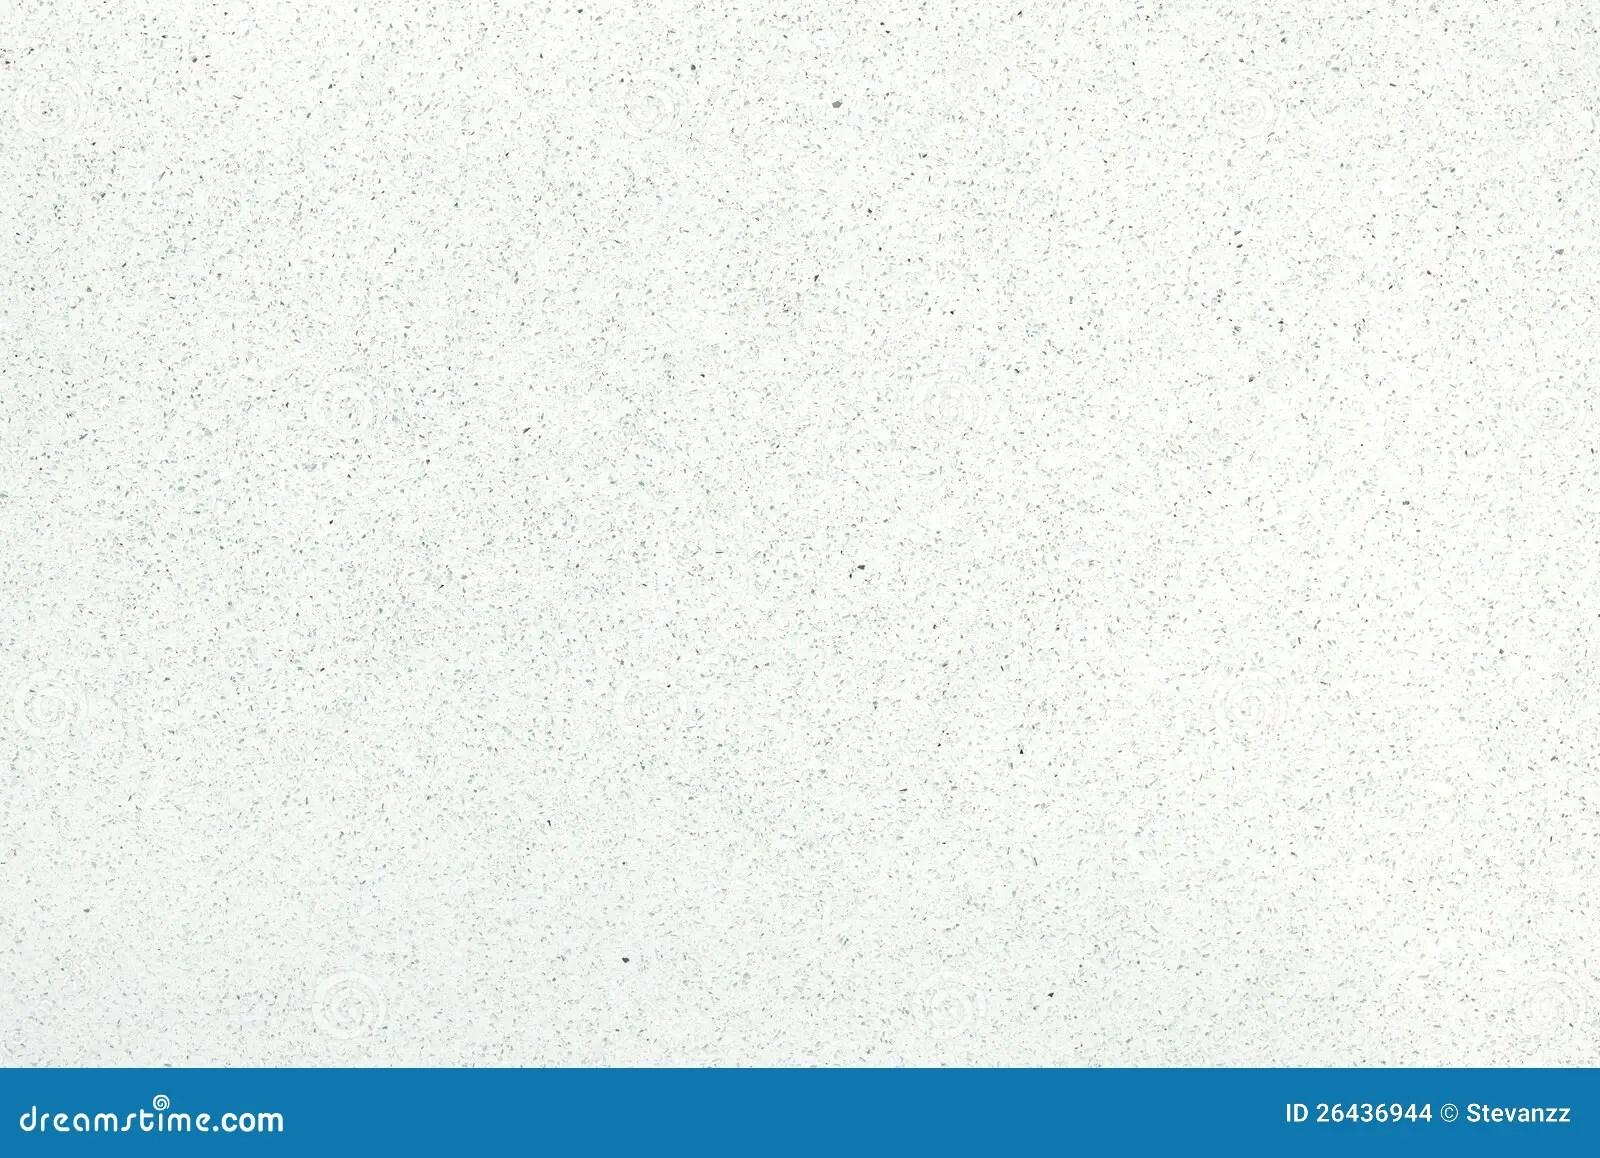 Quartz Surface For Bathroom Or Kitchen Countertop Stock